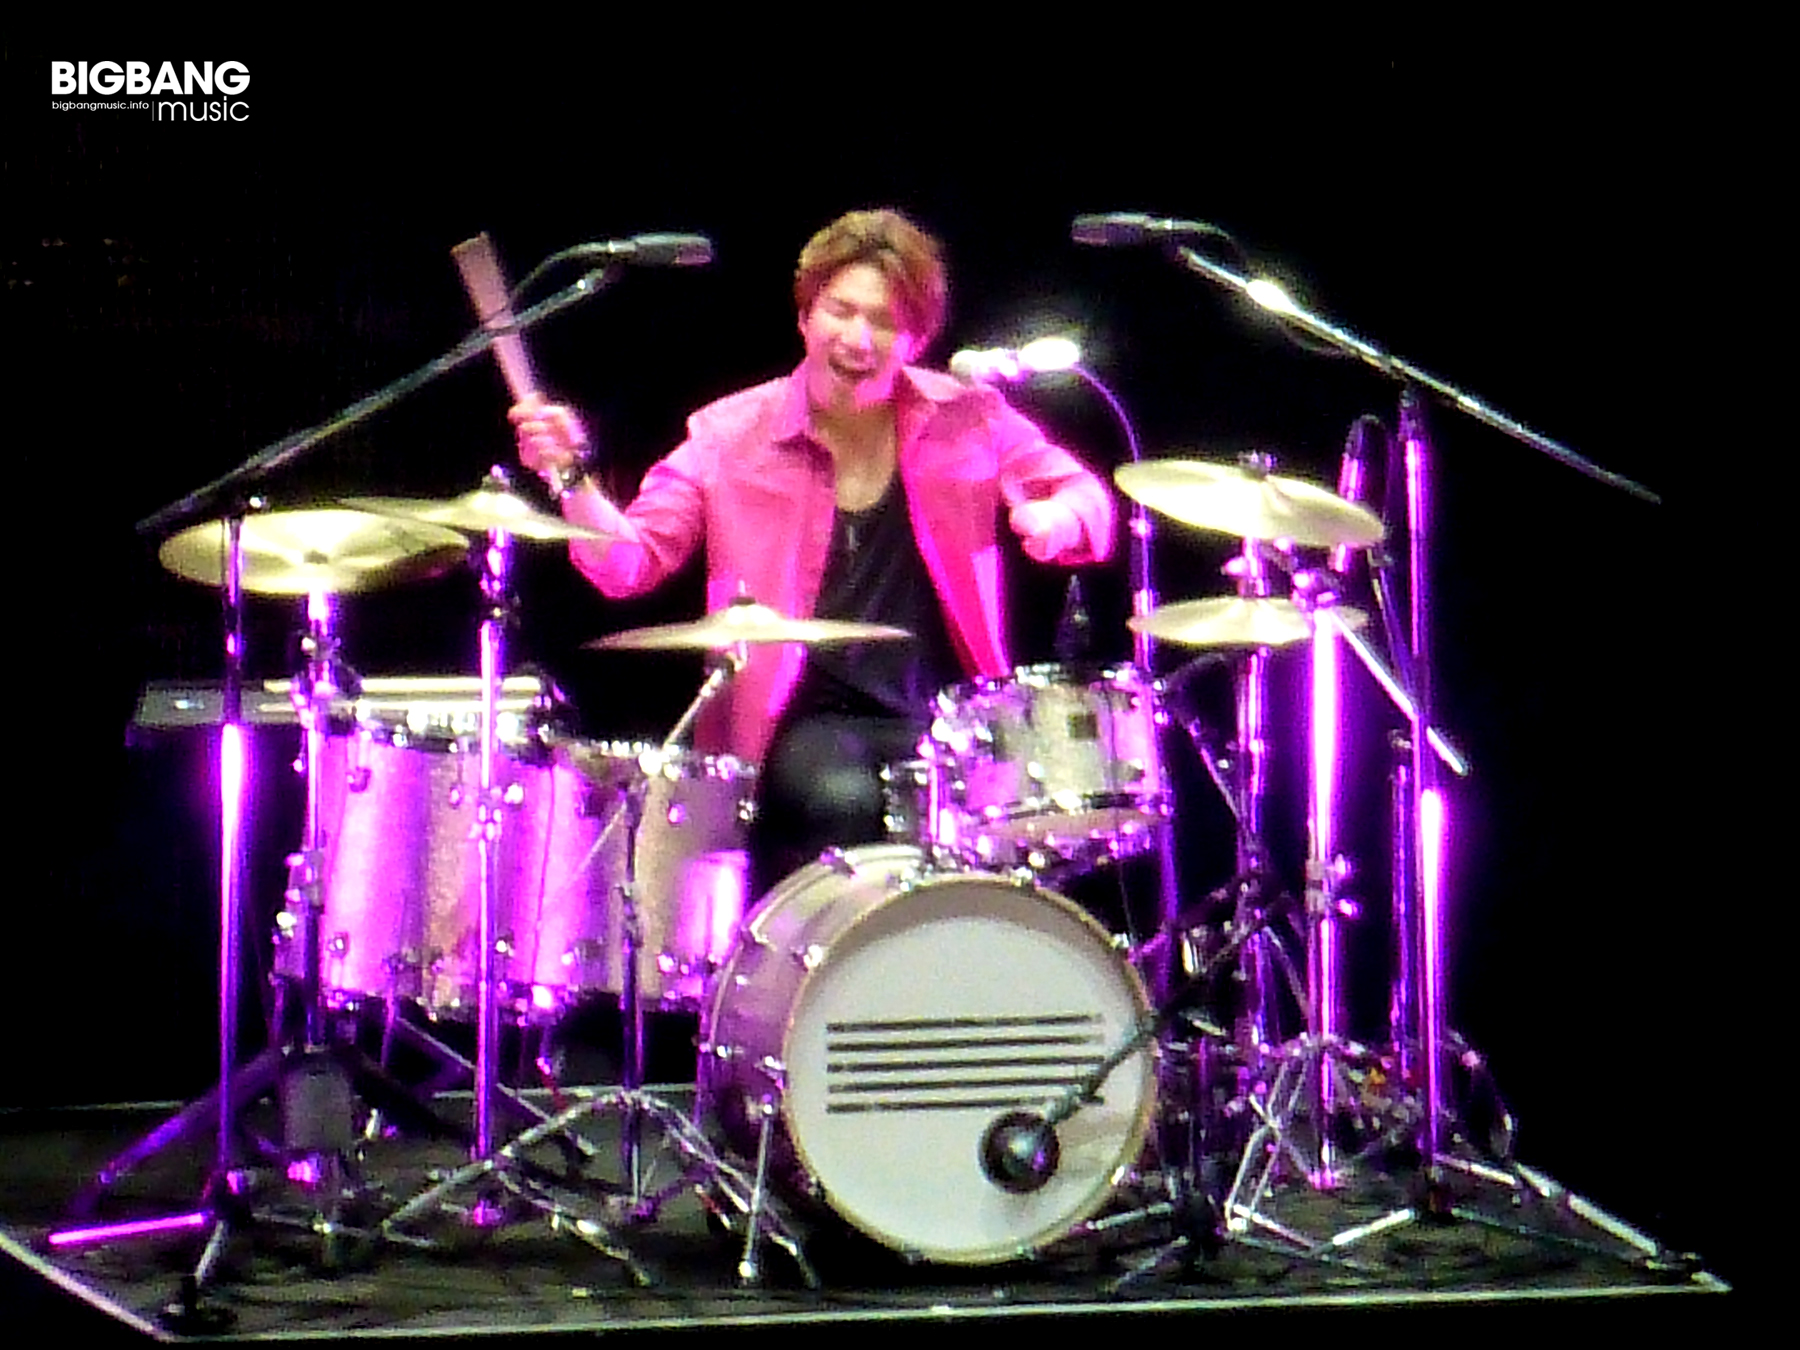 BIGBANG-Osaka-Day-5-2016-01-10-BIGBANG-10.jpg